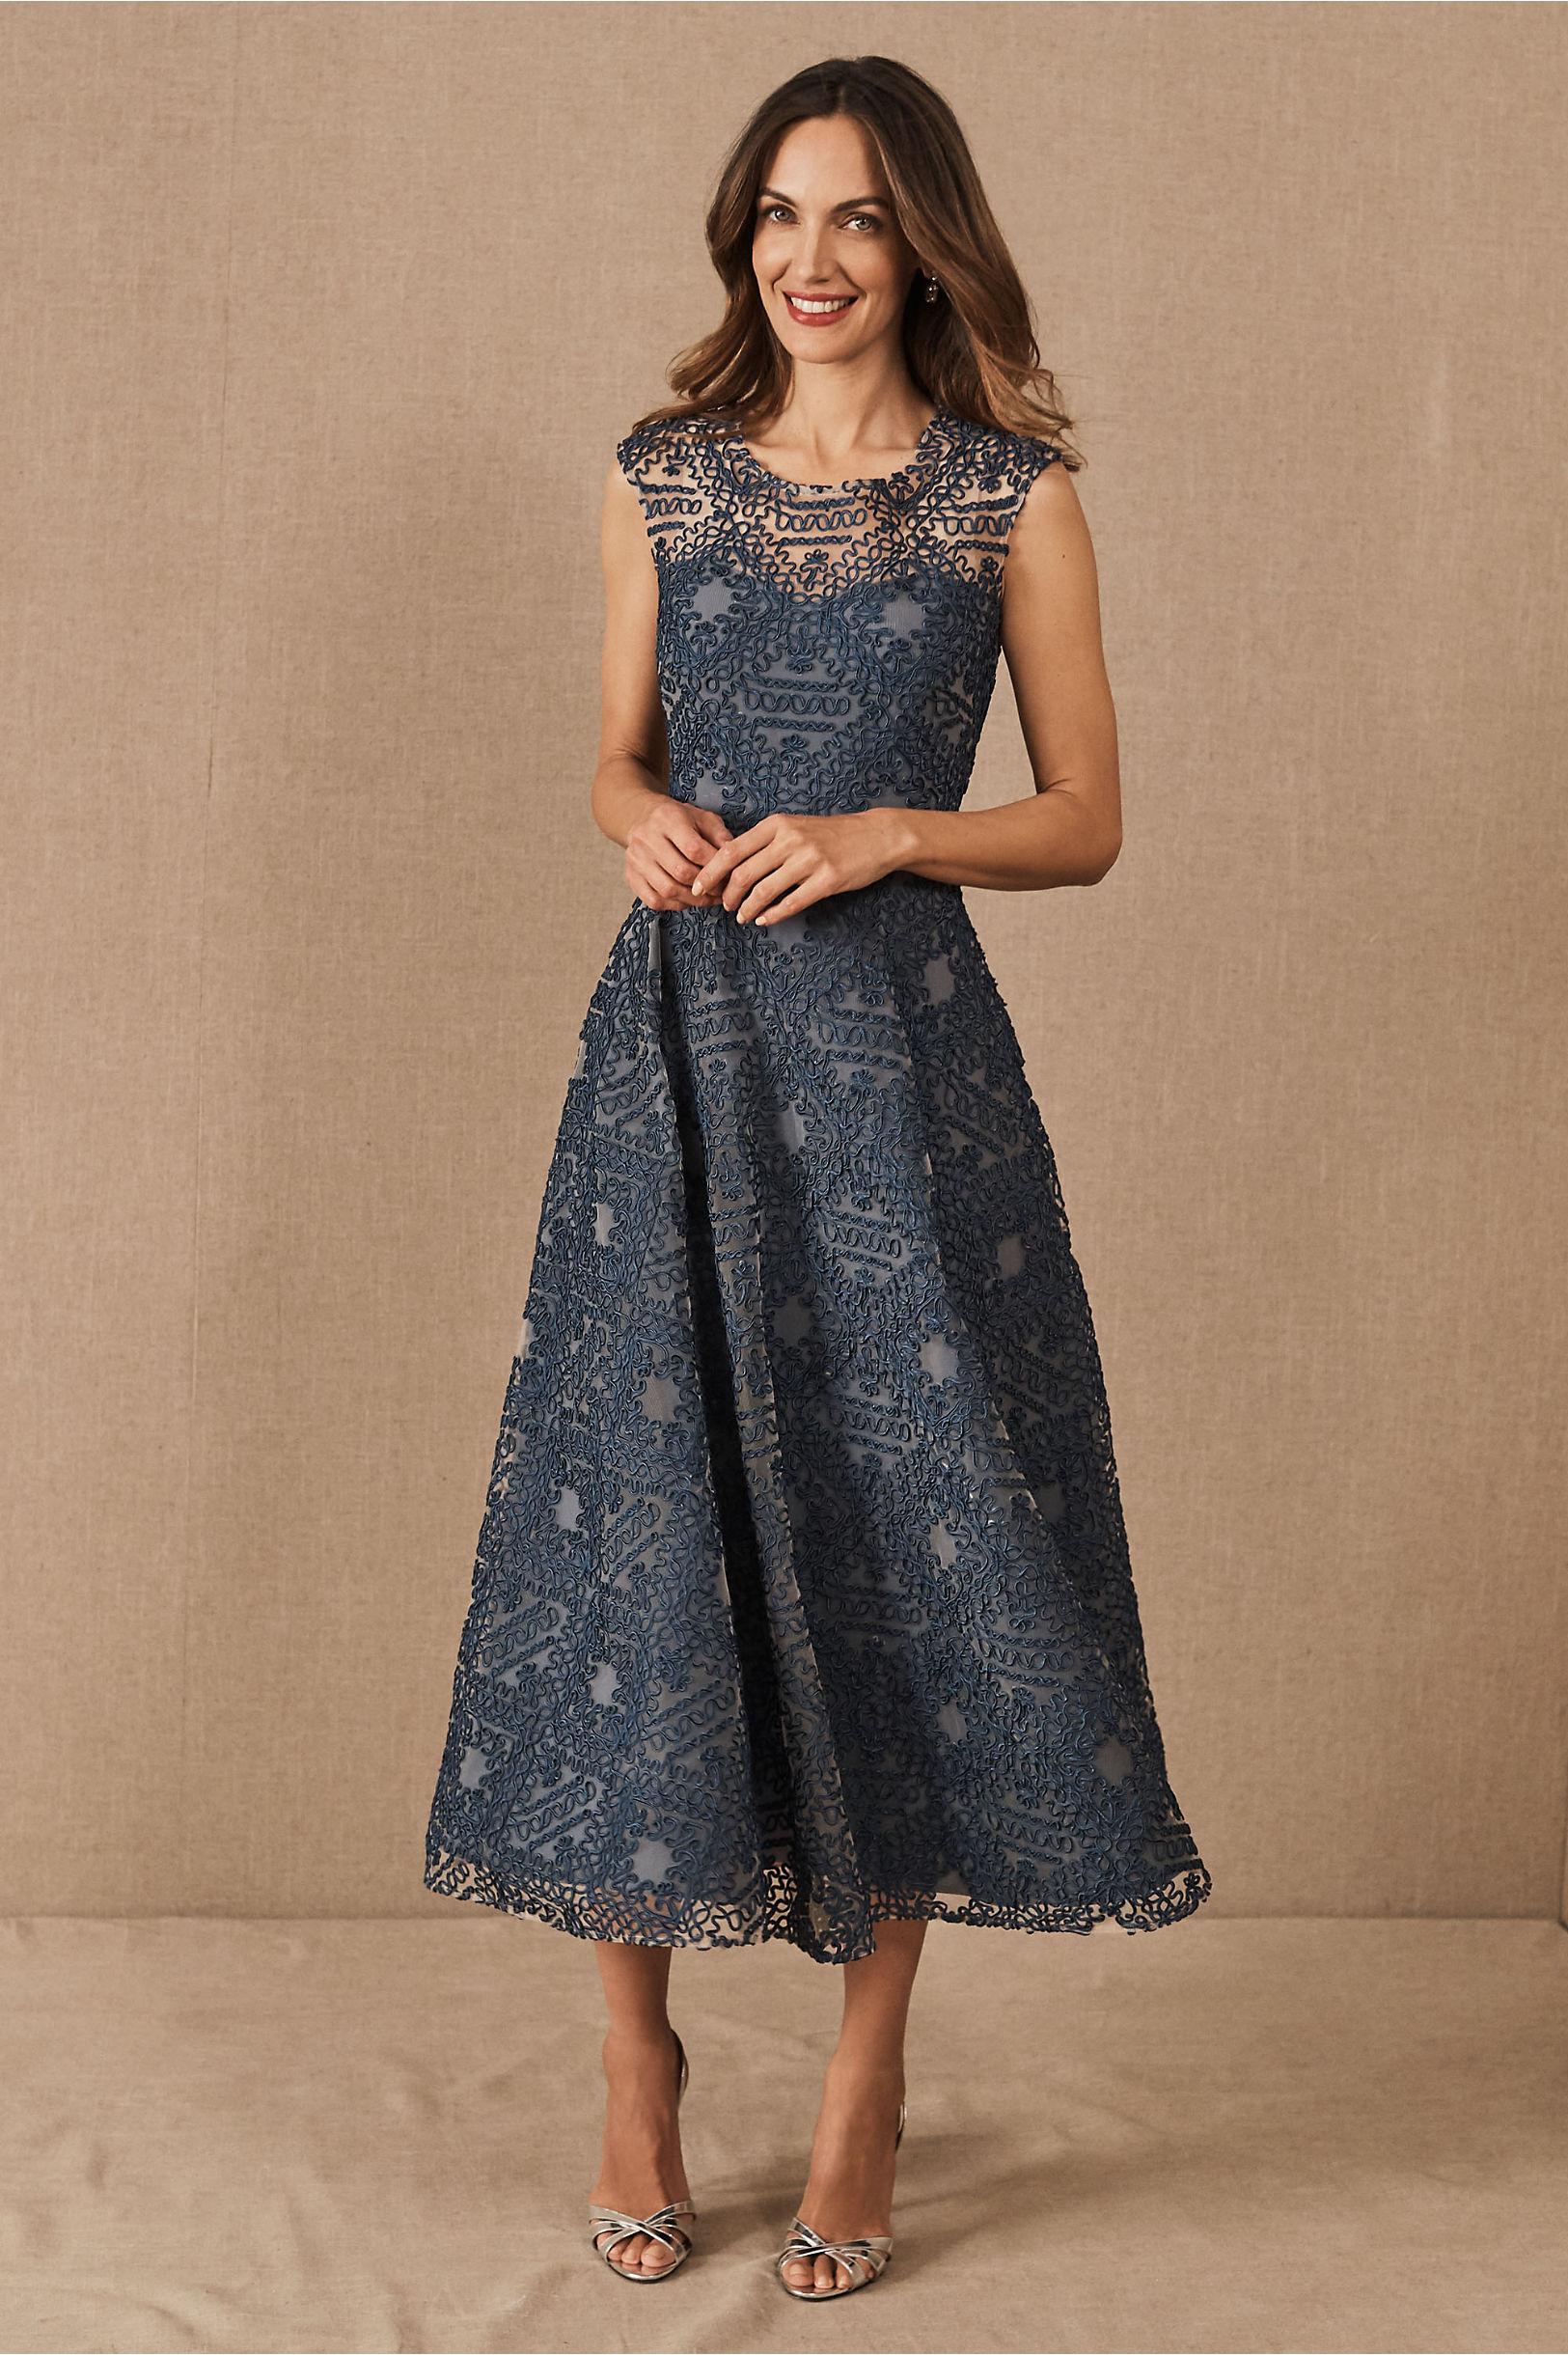 7dfb2e2a553 Presley Dress Blue in Bridesmaids   Bridal Party